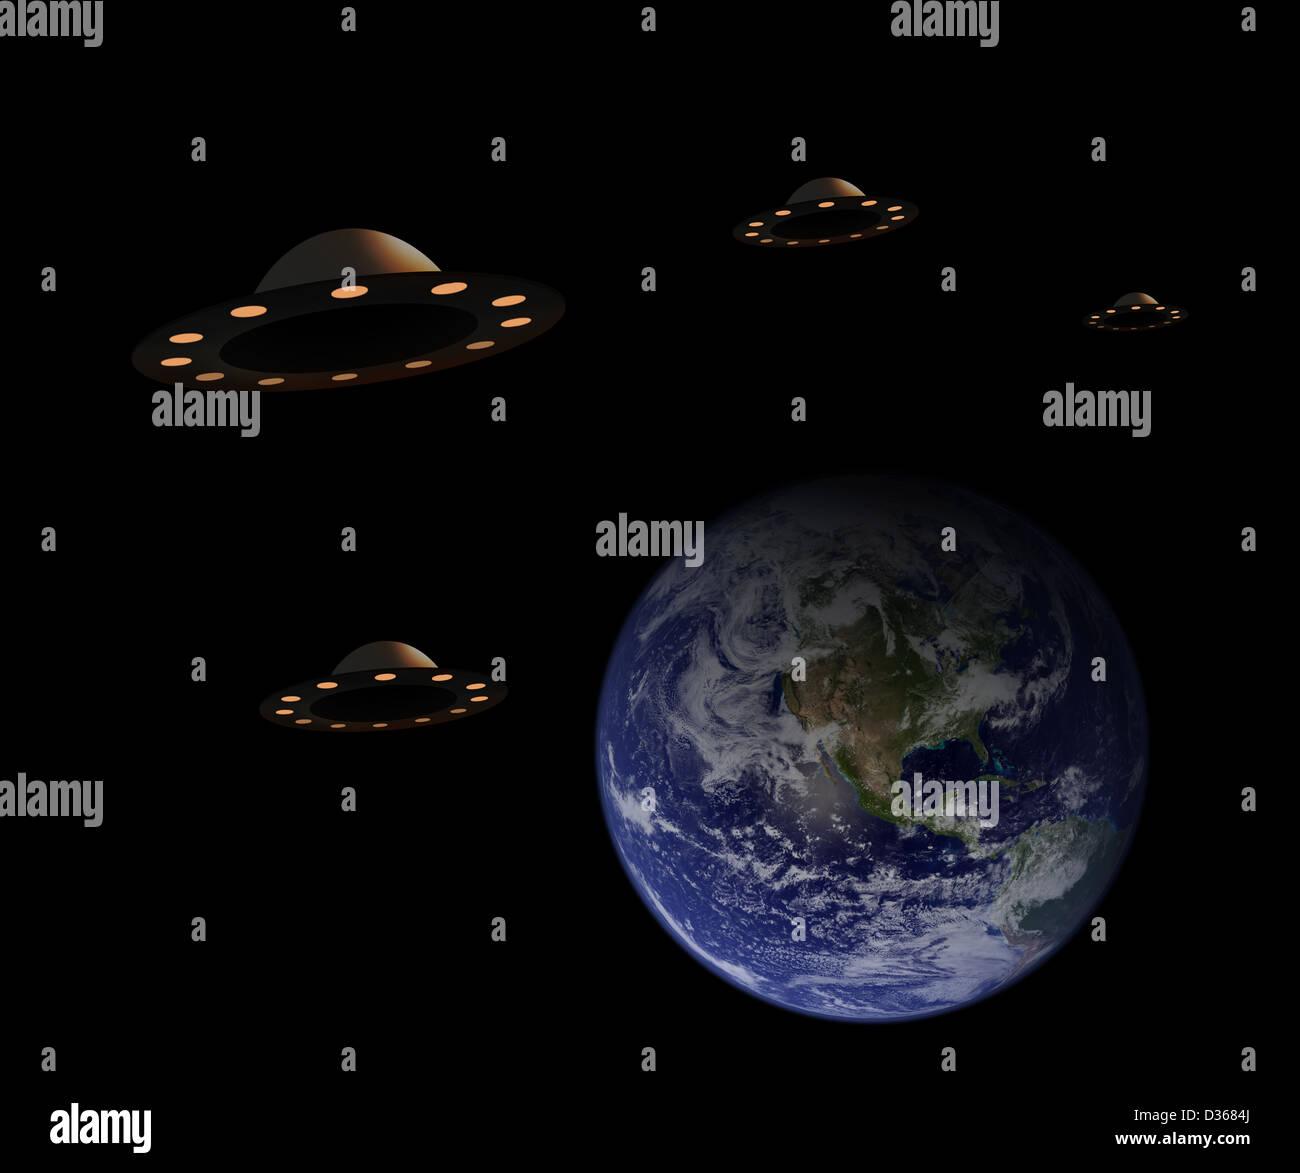 NASA Alien Invasion - Pics about space